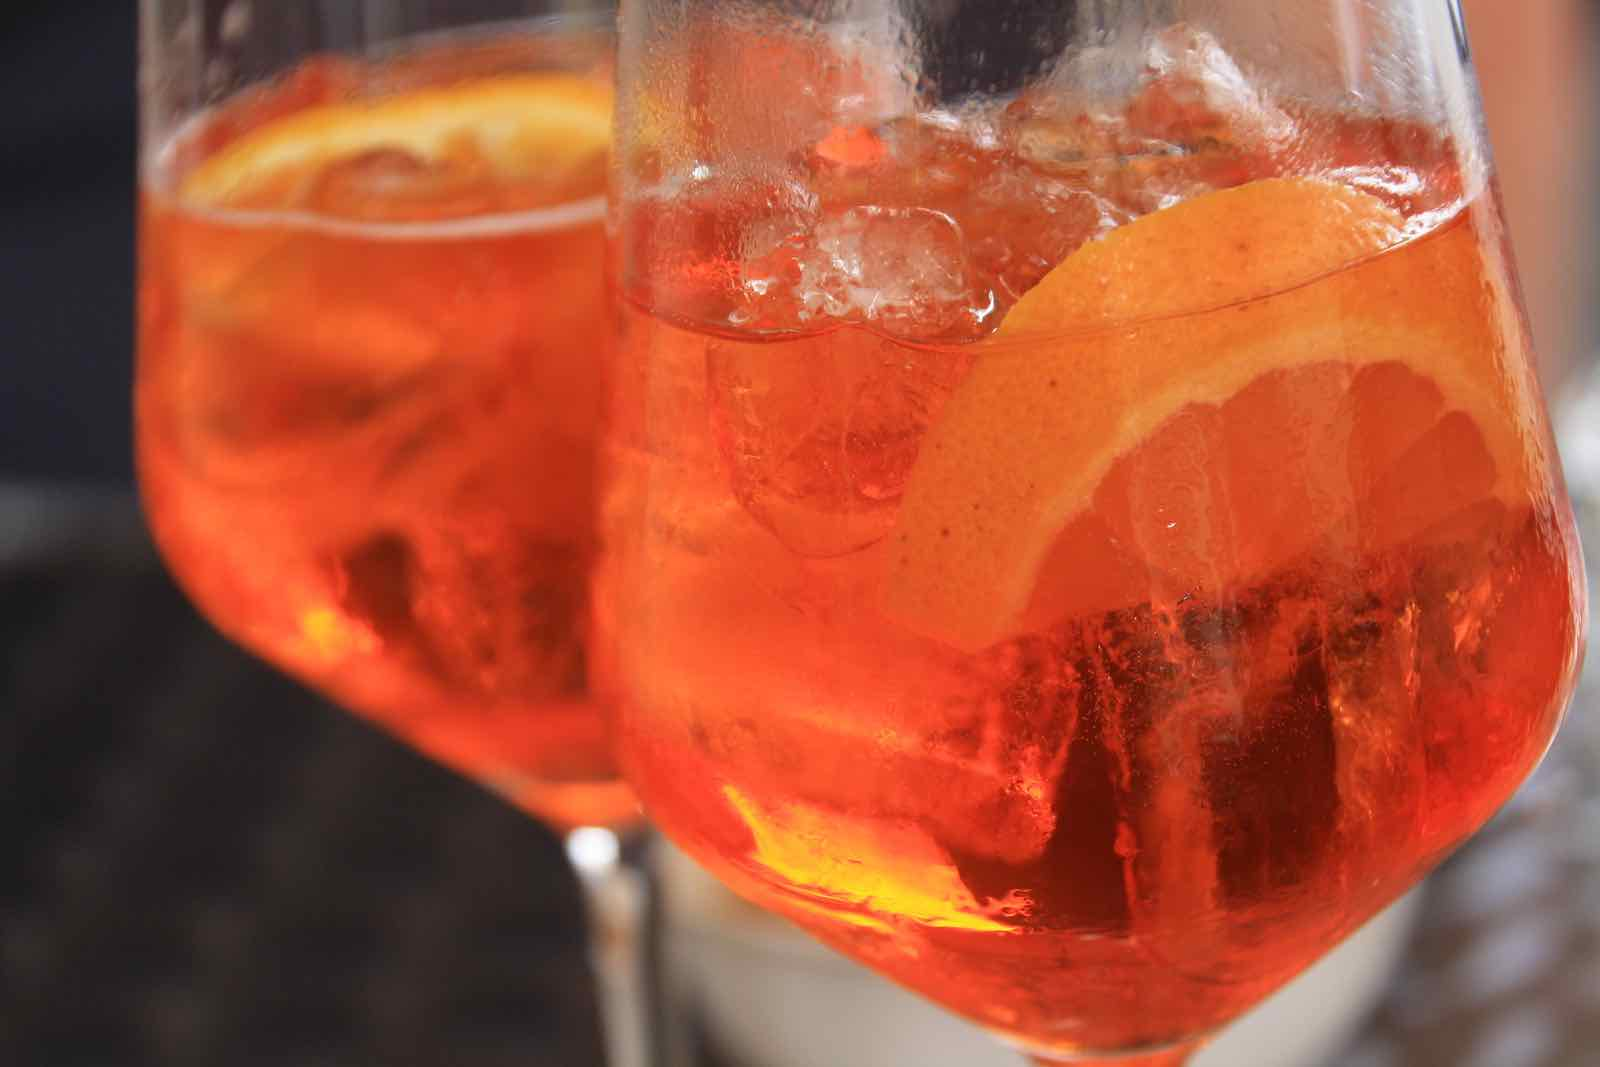 Deux verres d'aperol spritz garni d'une rondelle d'orange